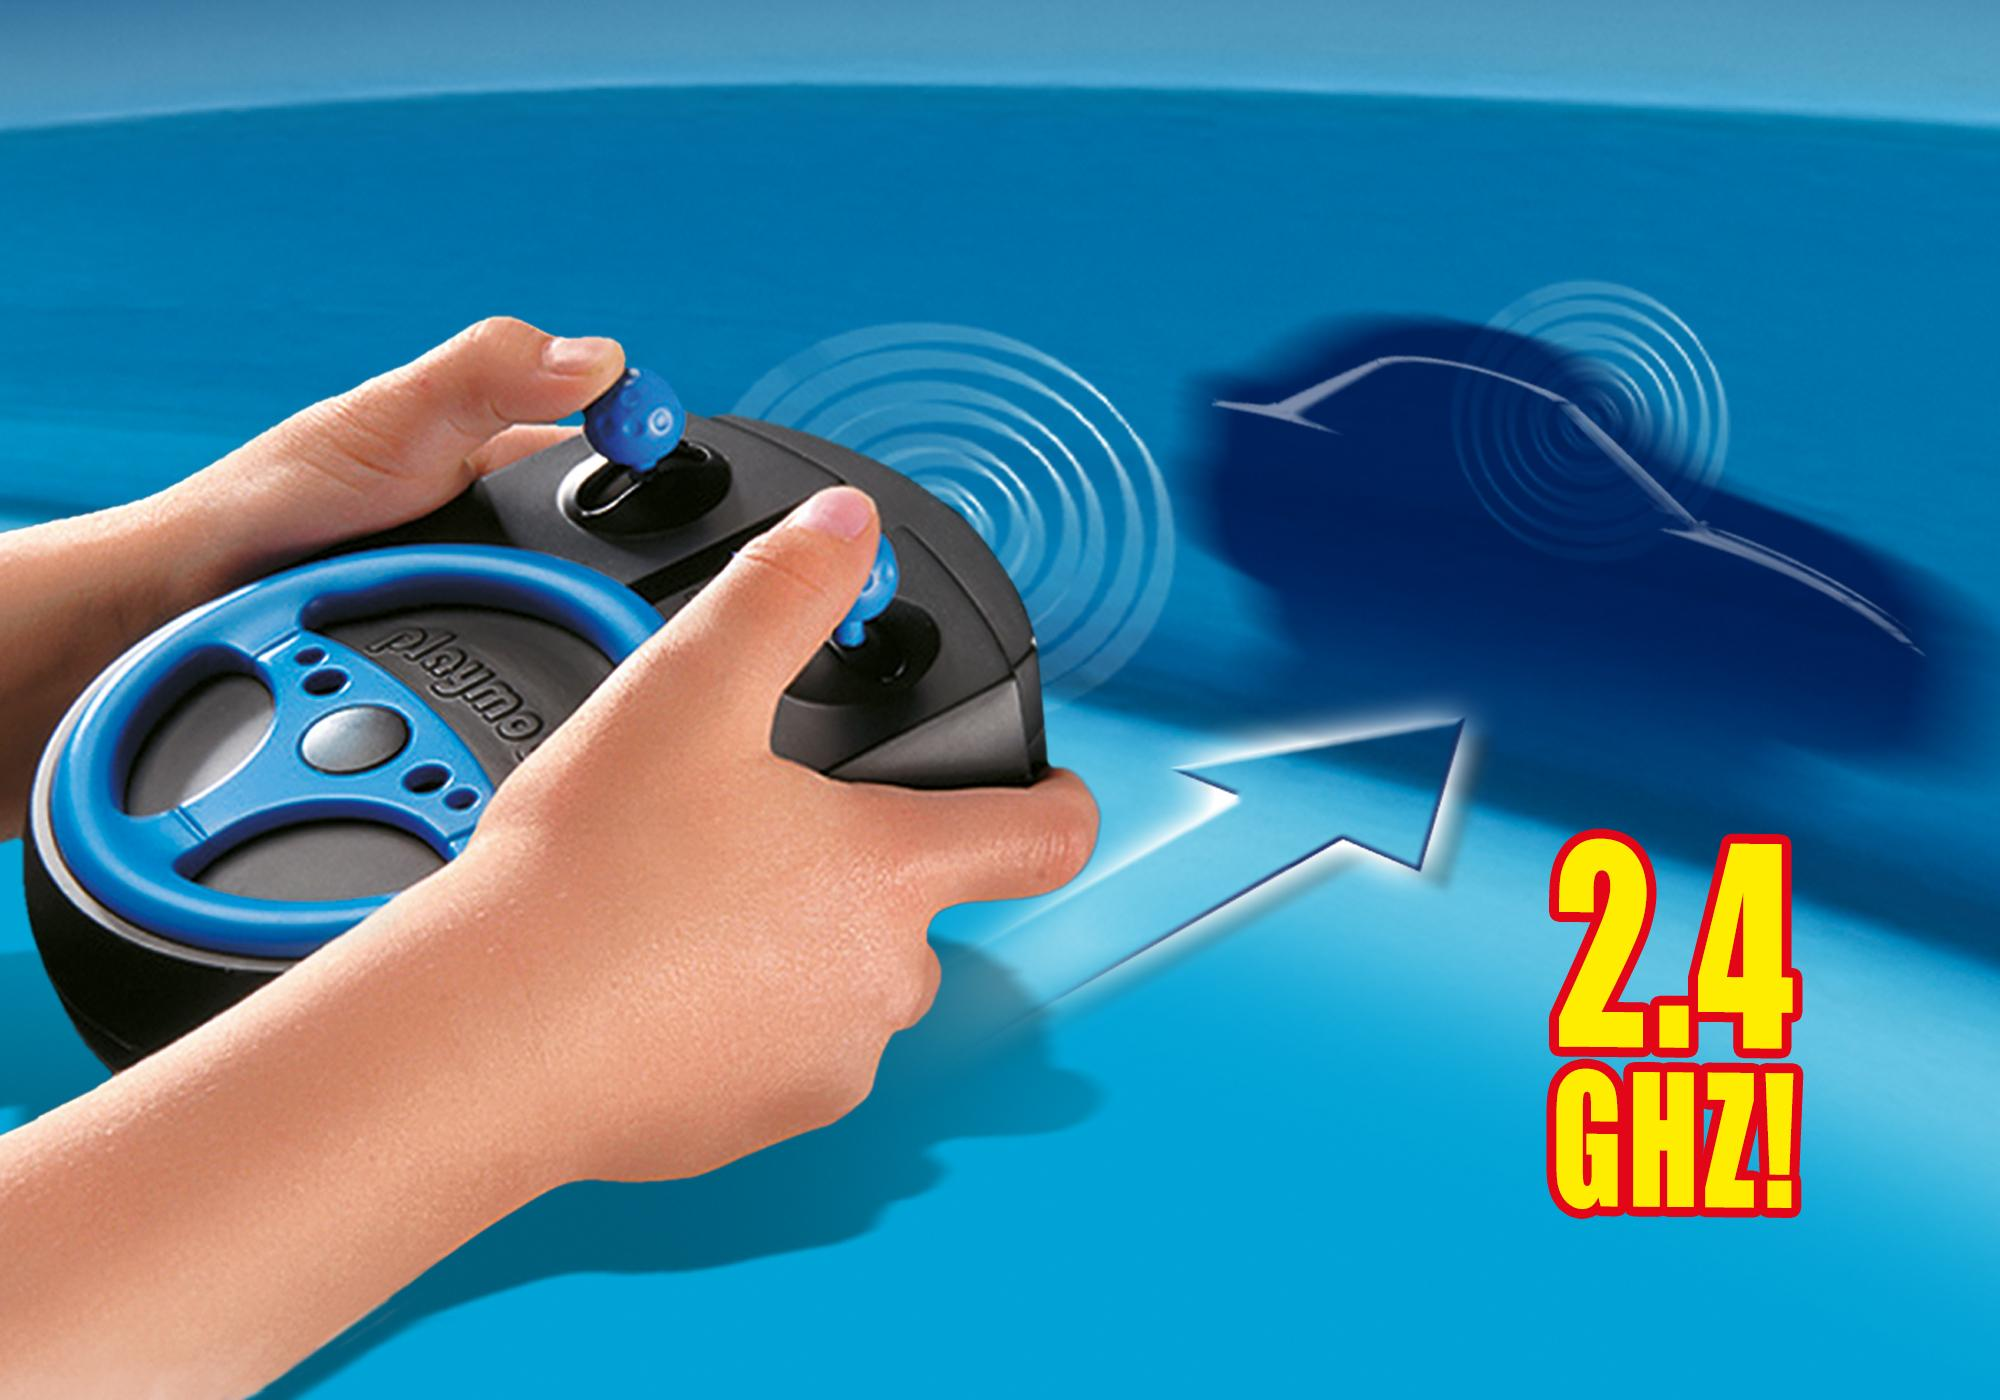 http://media.playmobil.com/i/playmobil/6914_product_extra2/RC-module 2,4 GHz